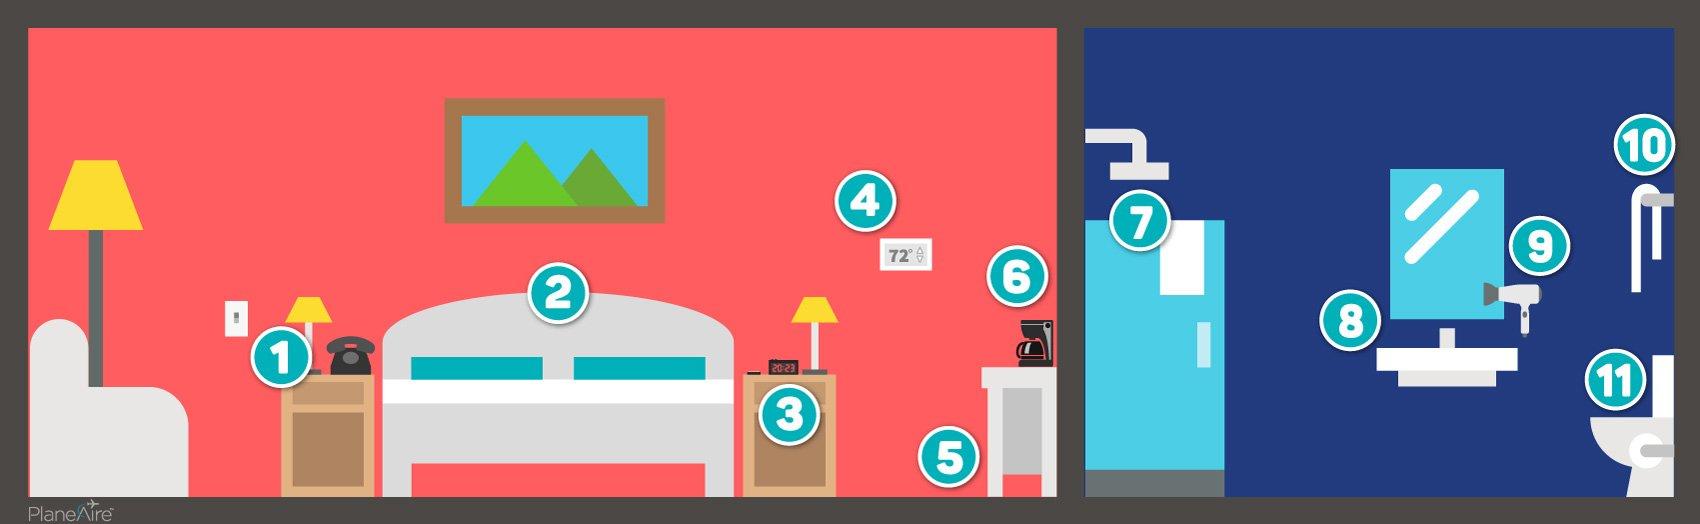 Harmful Bacteria Hotel Room Hot Spots